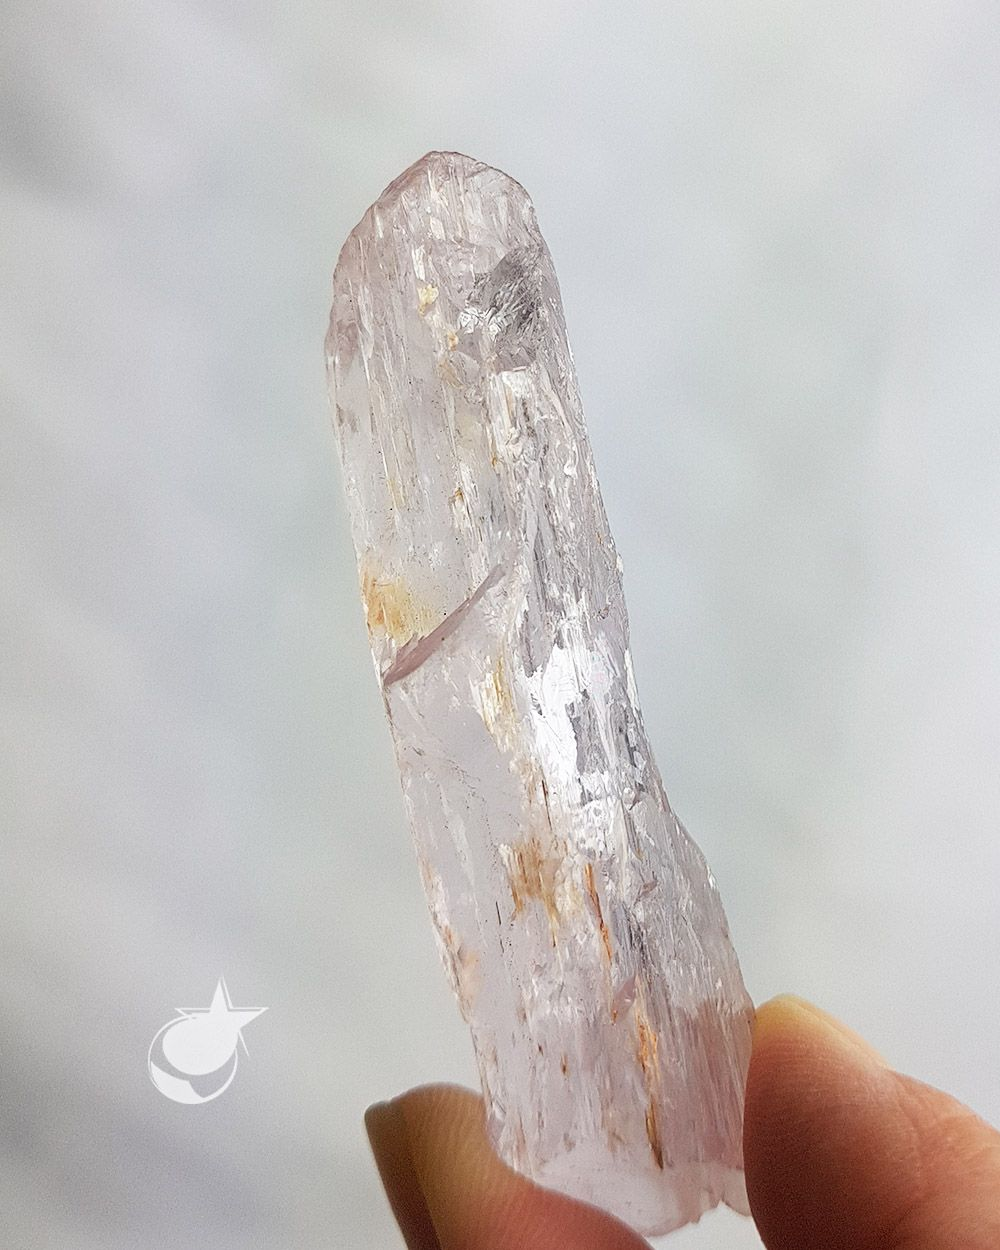 KUNZITA BRUTA - 6,9 cm